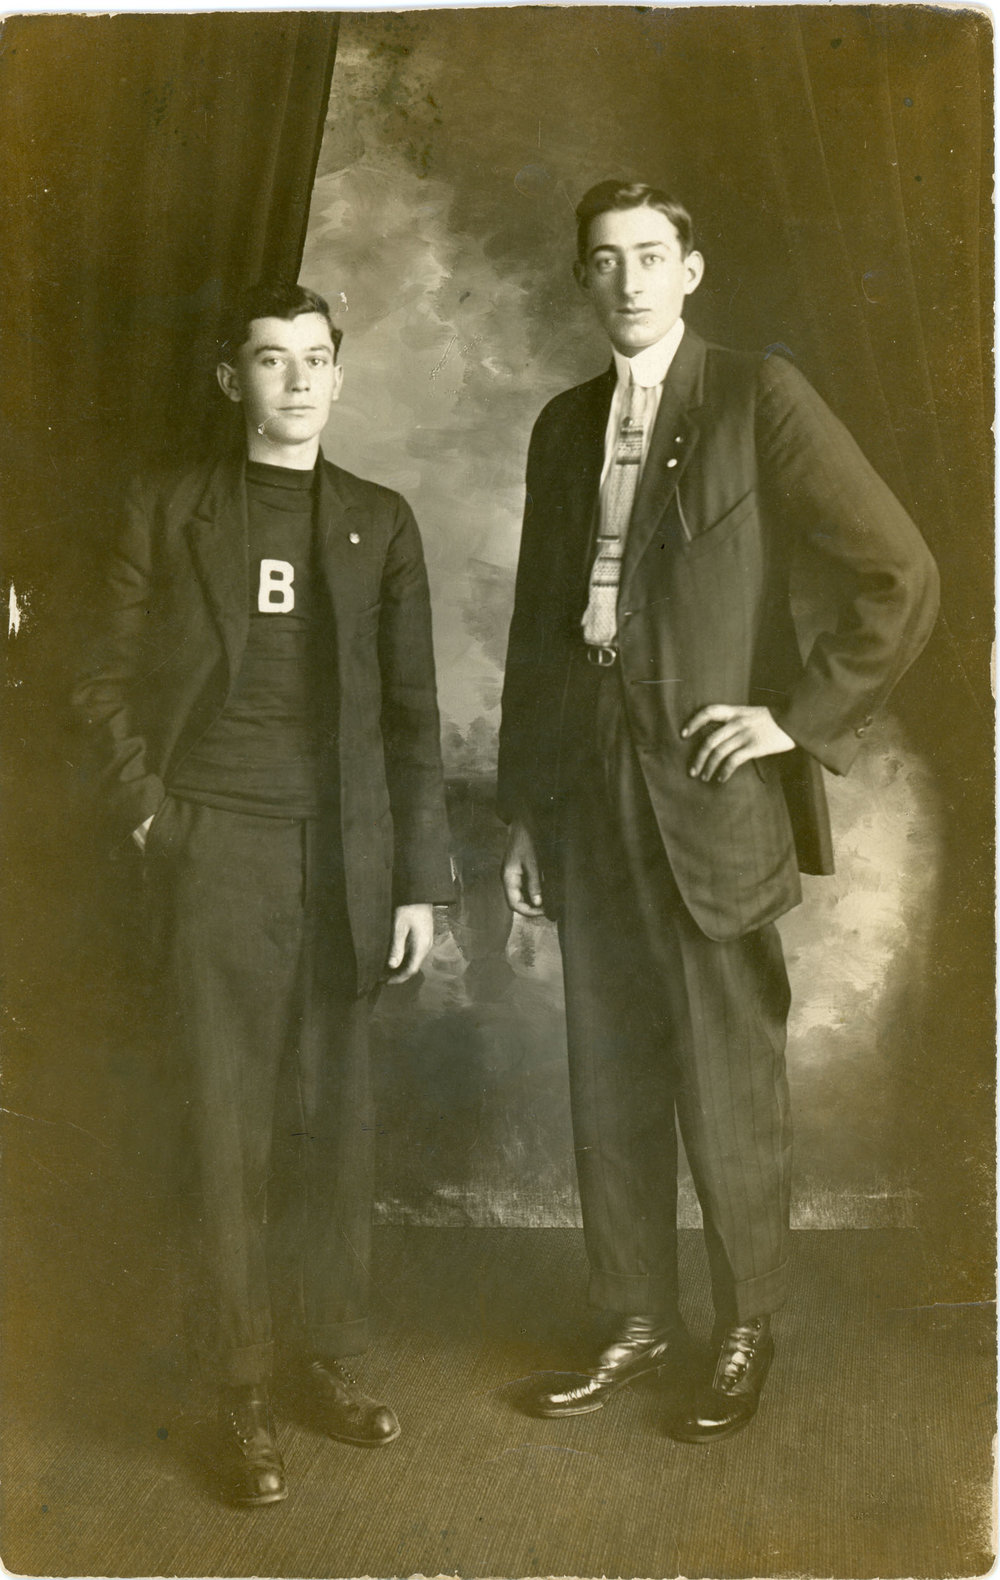 Antique photograph of Lloyd Fullmor, son of Bell Patno